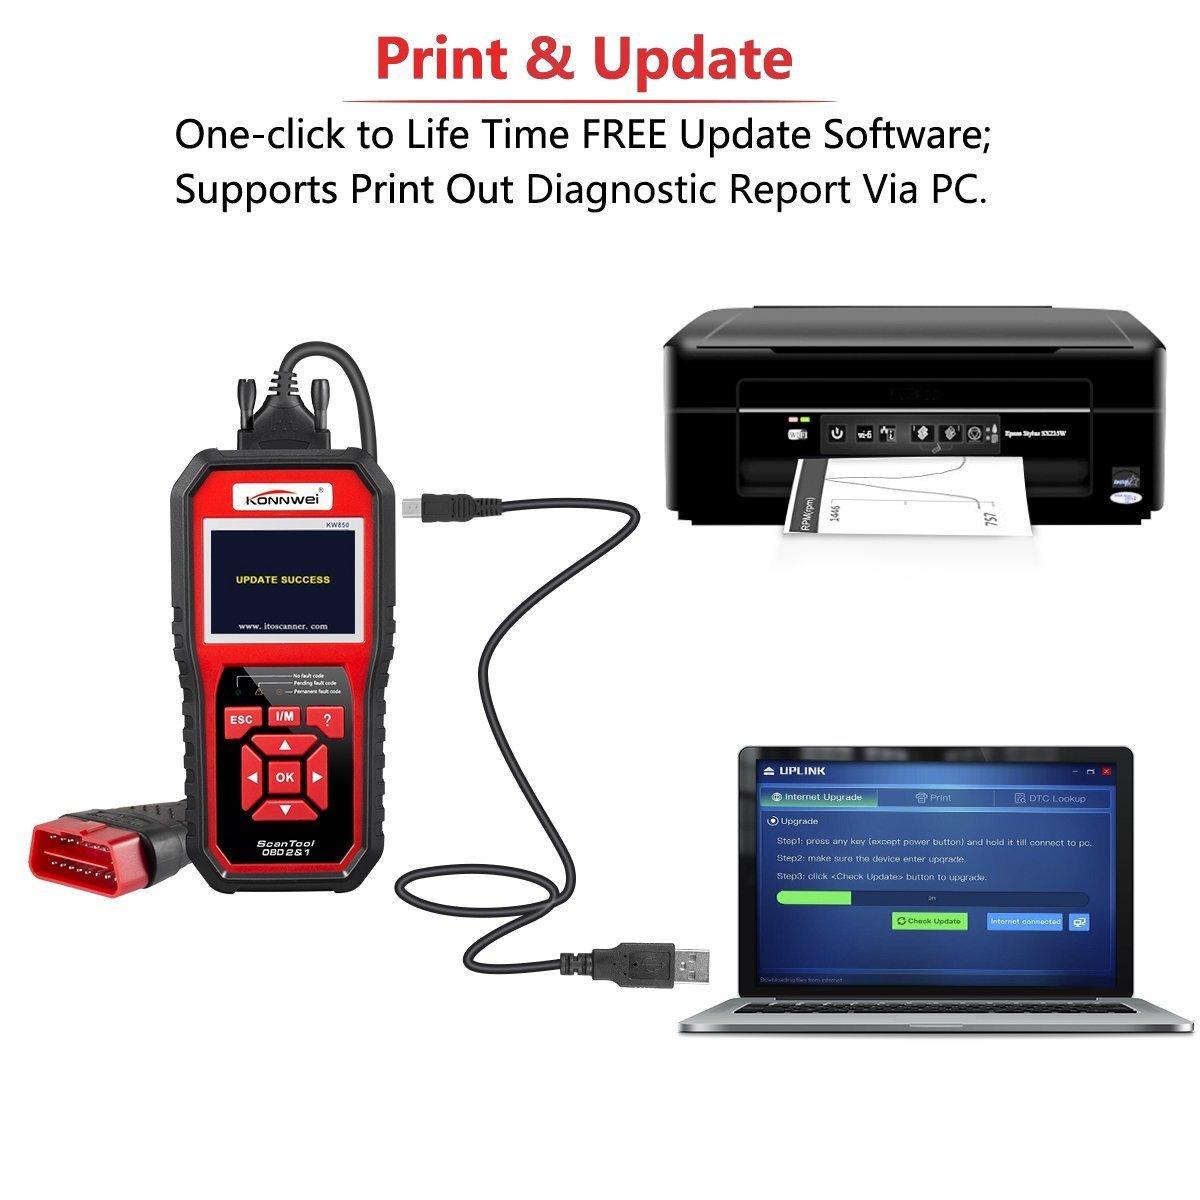 KONNWEI OBD2 Scanner OBDII Auto Diagnostic Code Scanner Universal Vehicle Engine O2 Sensor Systems Scanner OBD2 EOBD Scanners Tool Check Engine Light Code Reader for all OBD II Protocol Car Since 1996 by KONNWEI (Image #7)